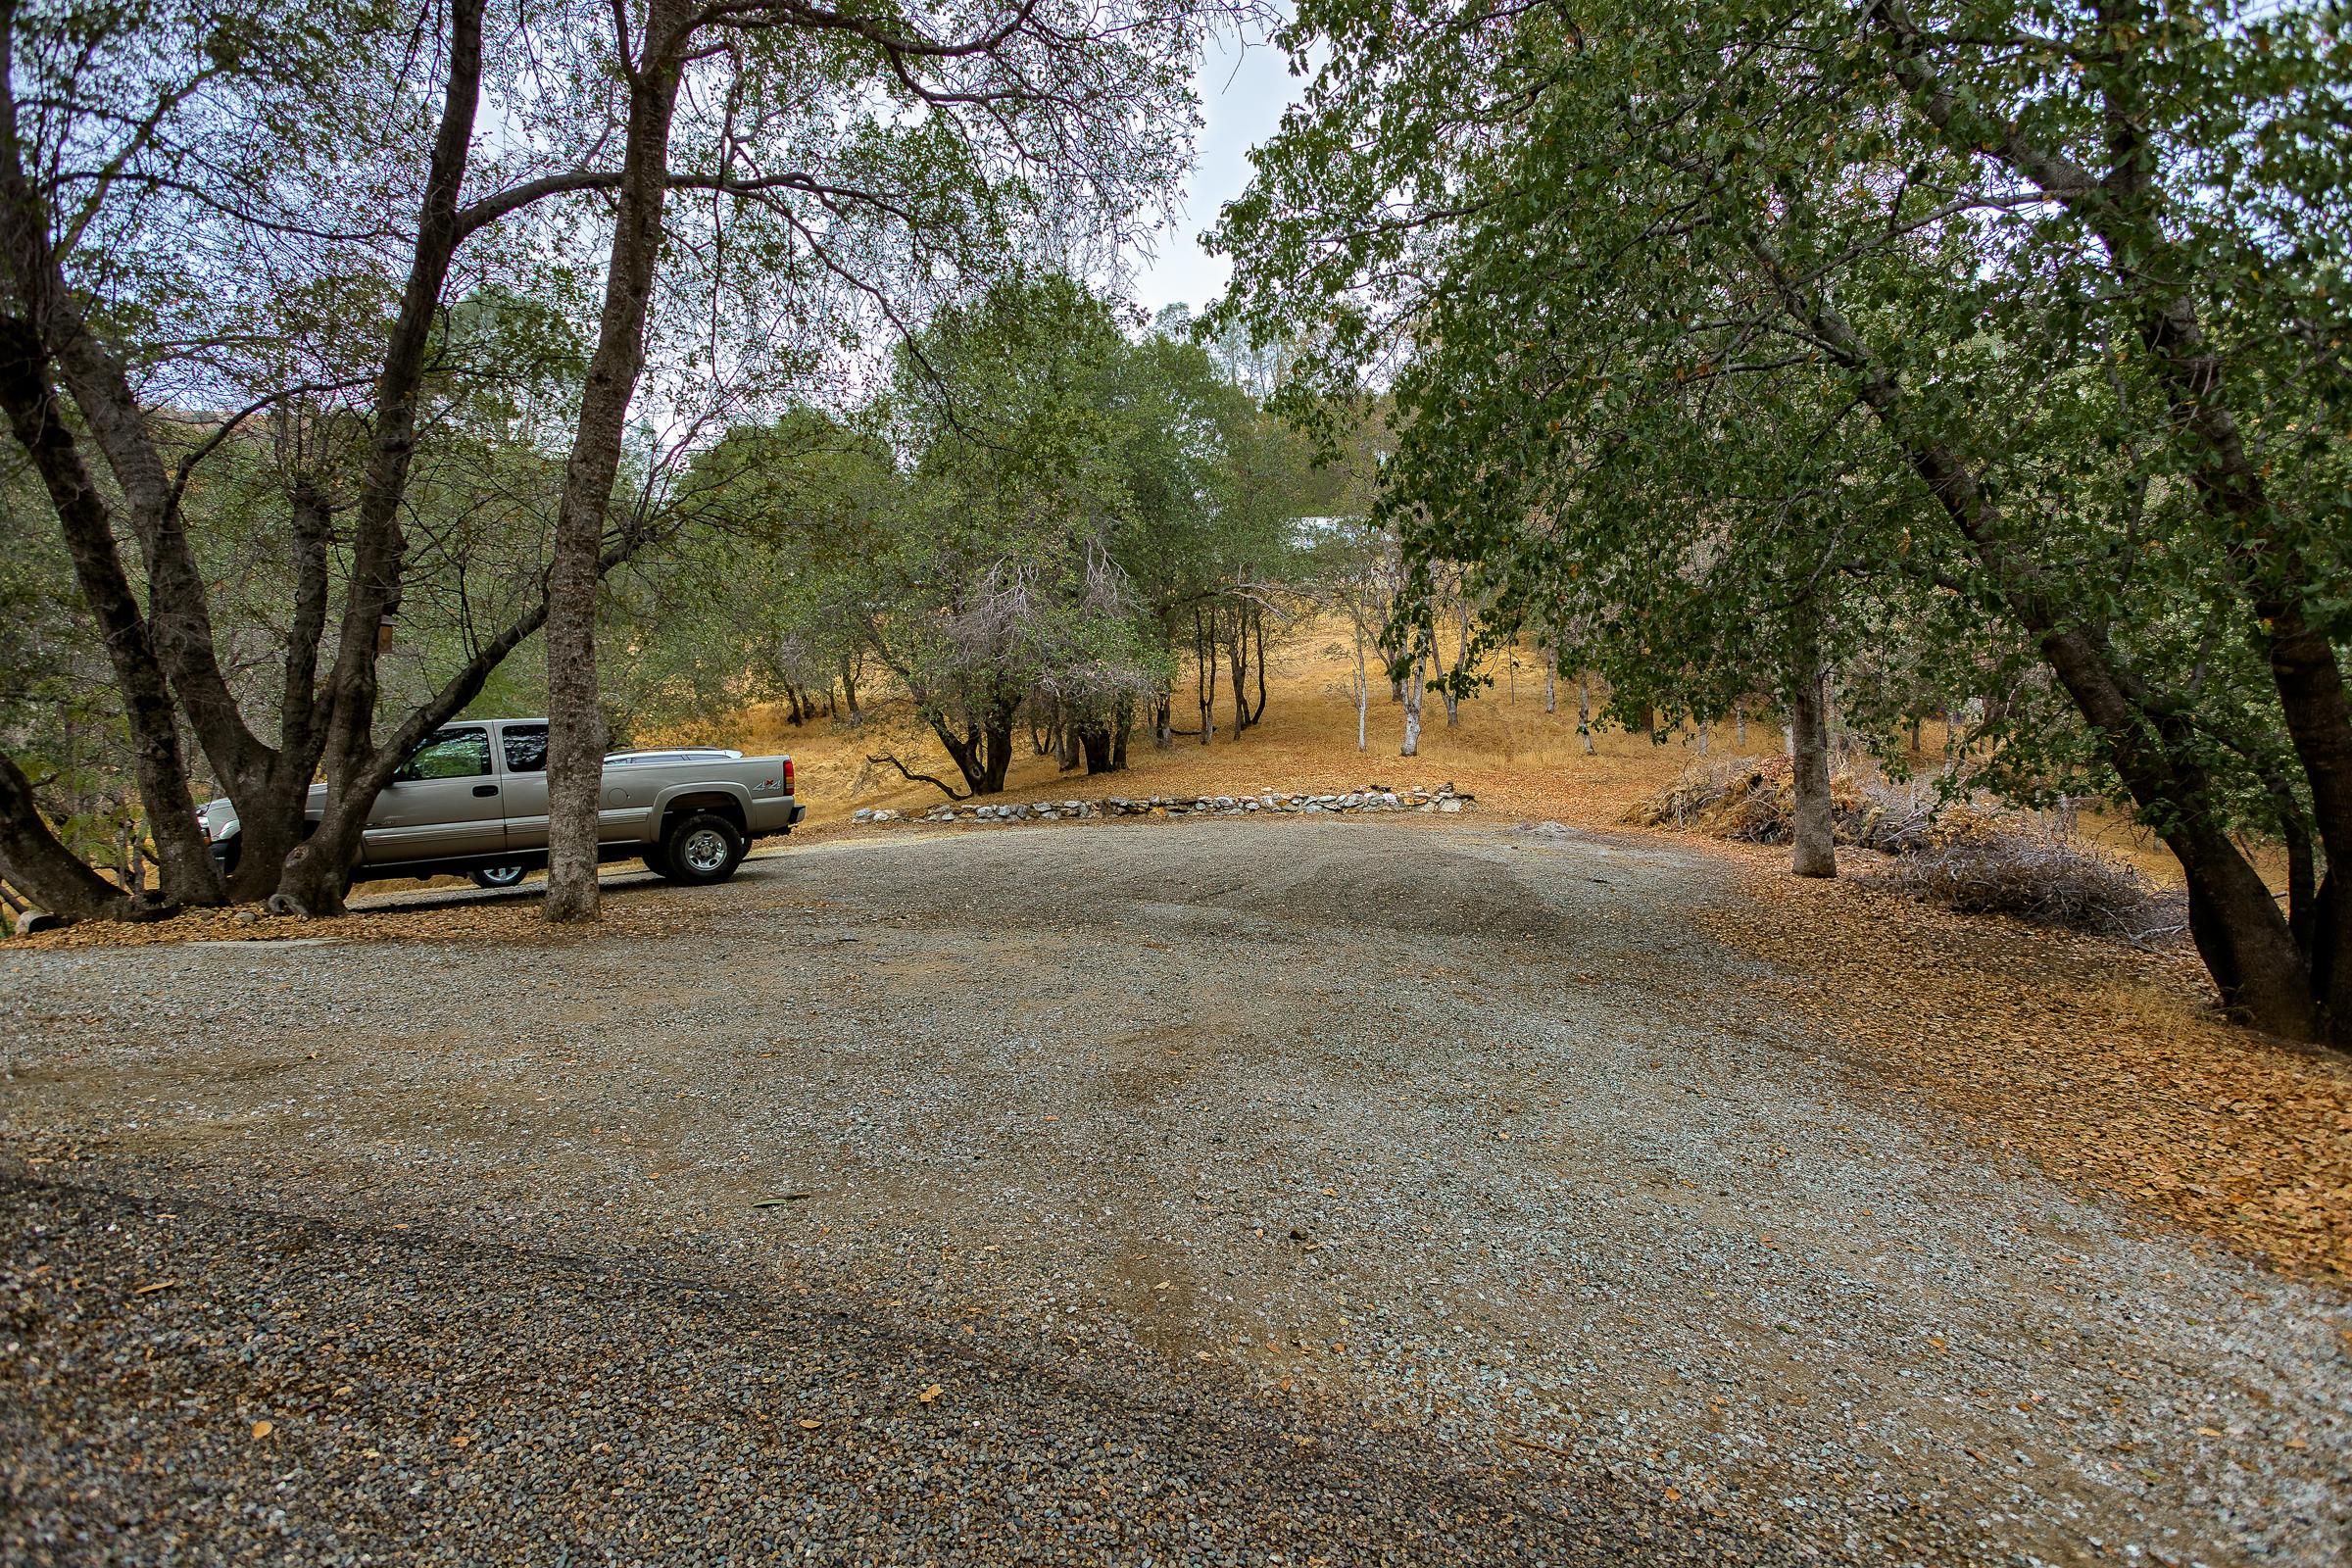 15692 Ranchland Dr, Redding, CA 96001